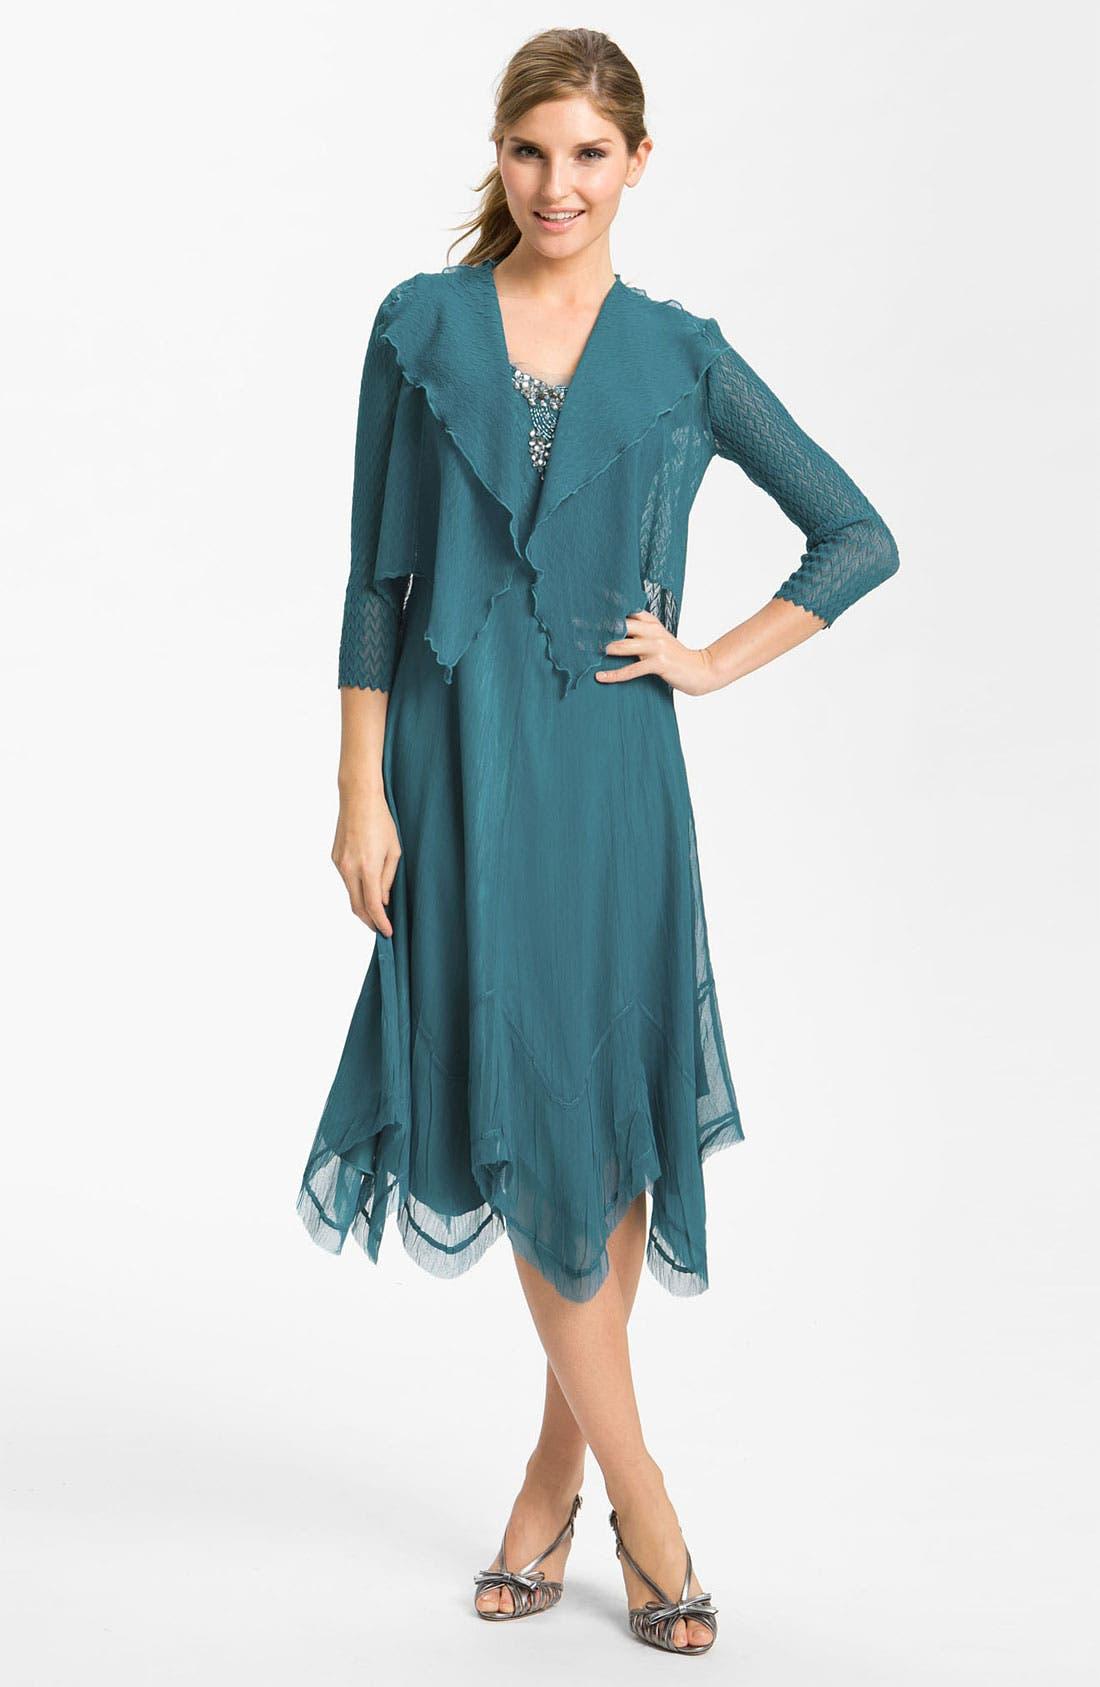 Main Image - Komarov Textured Dress & Jacket